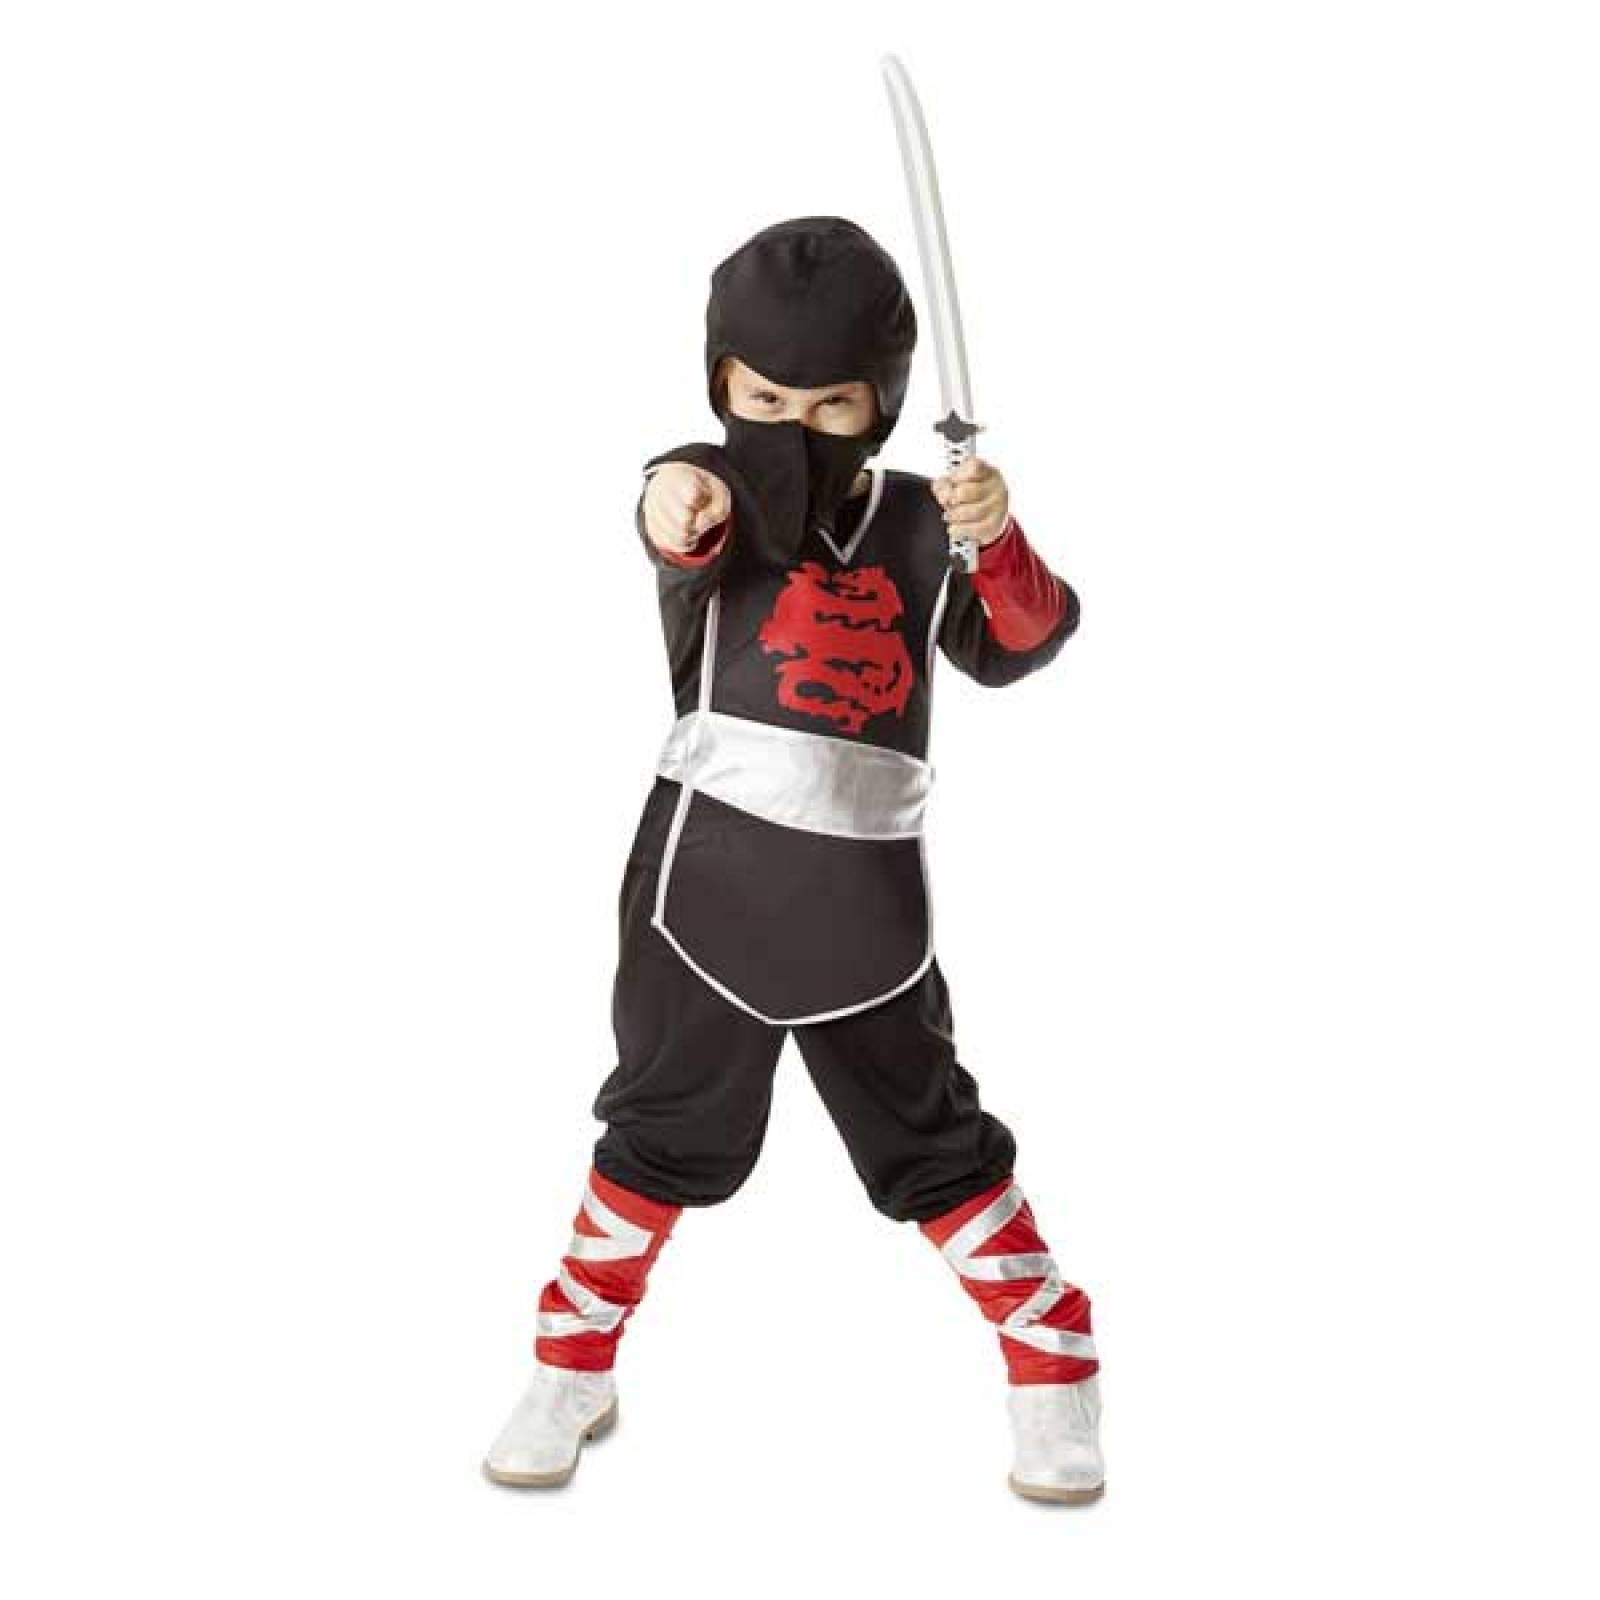 Fancy Dress Role Play Costume Set - Ninja